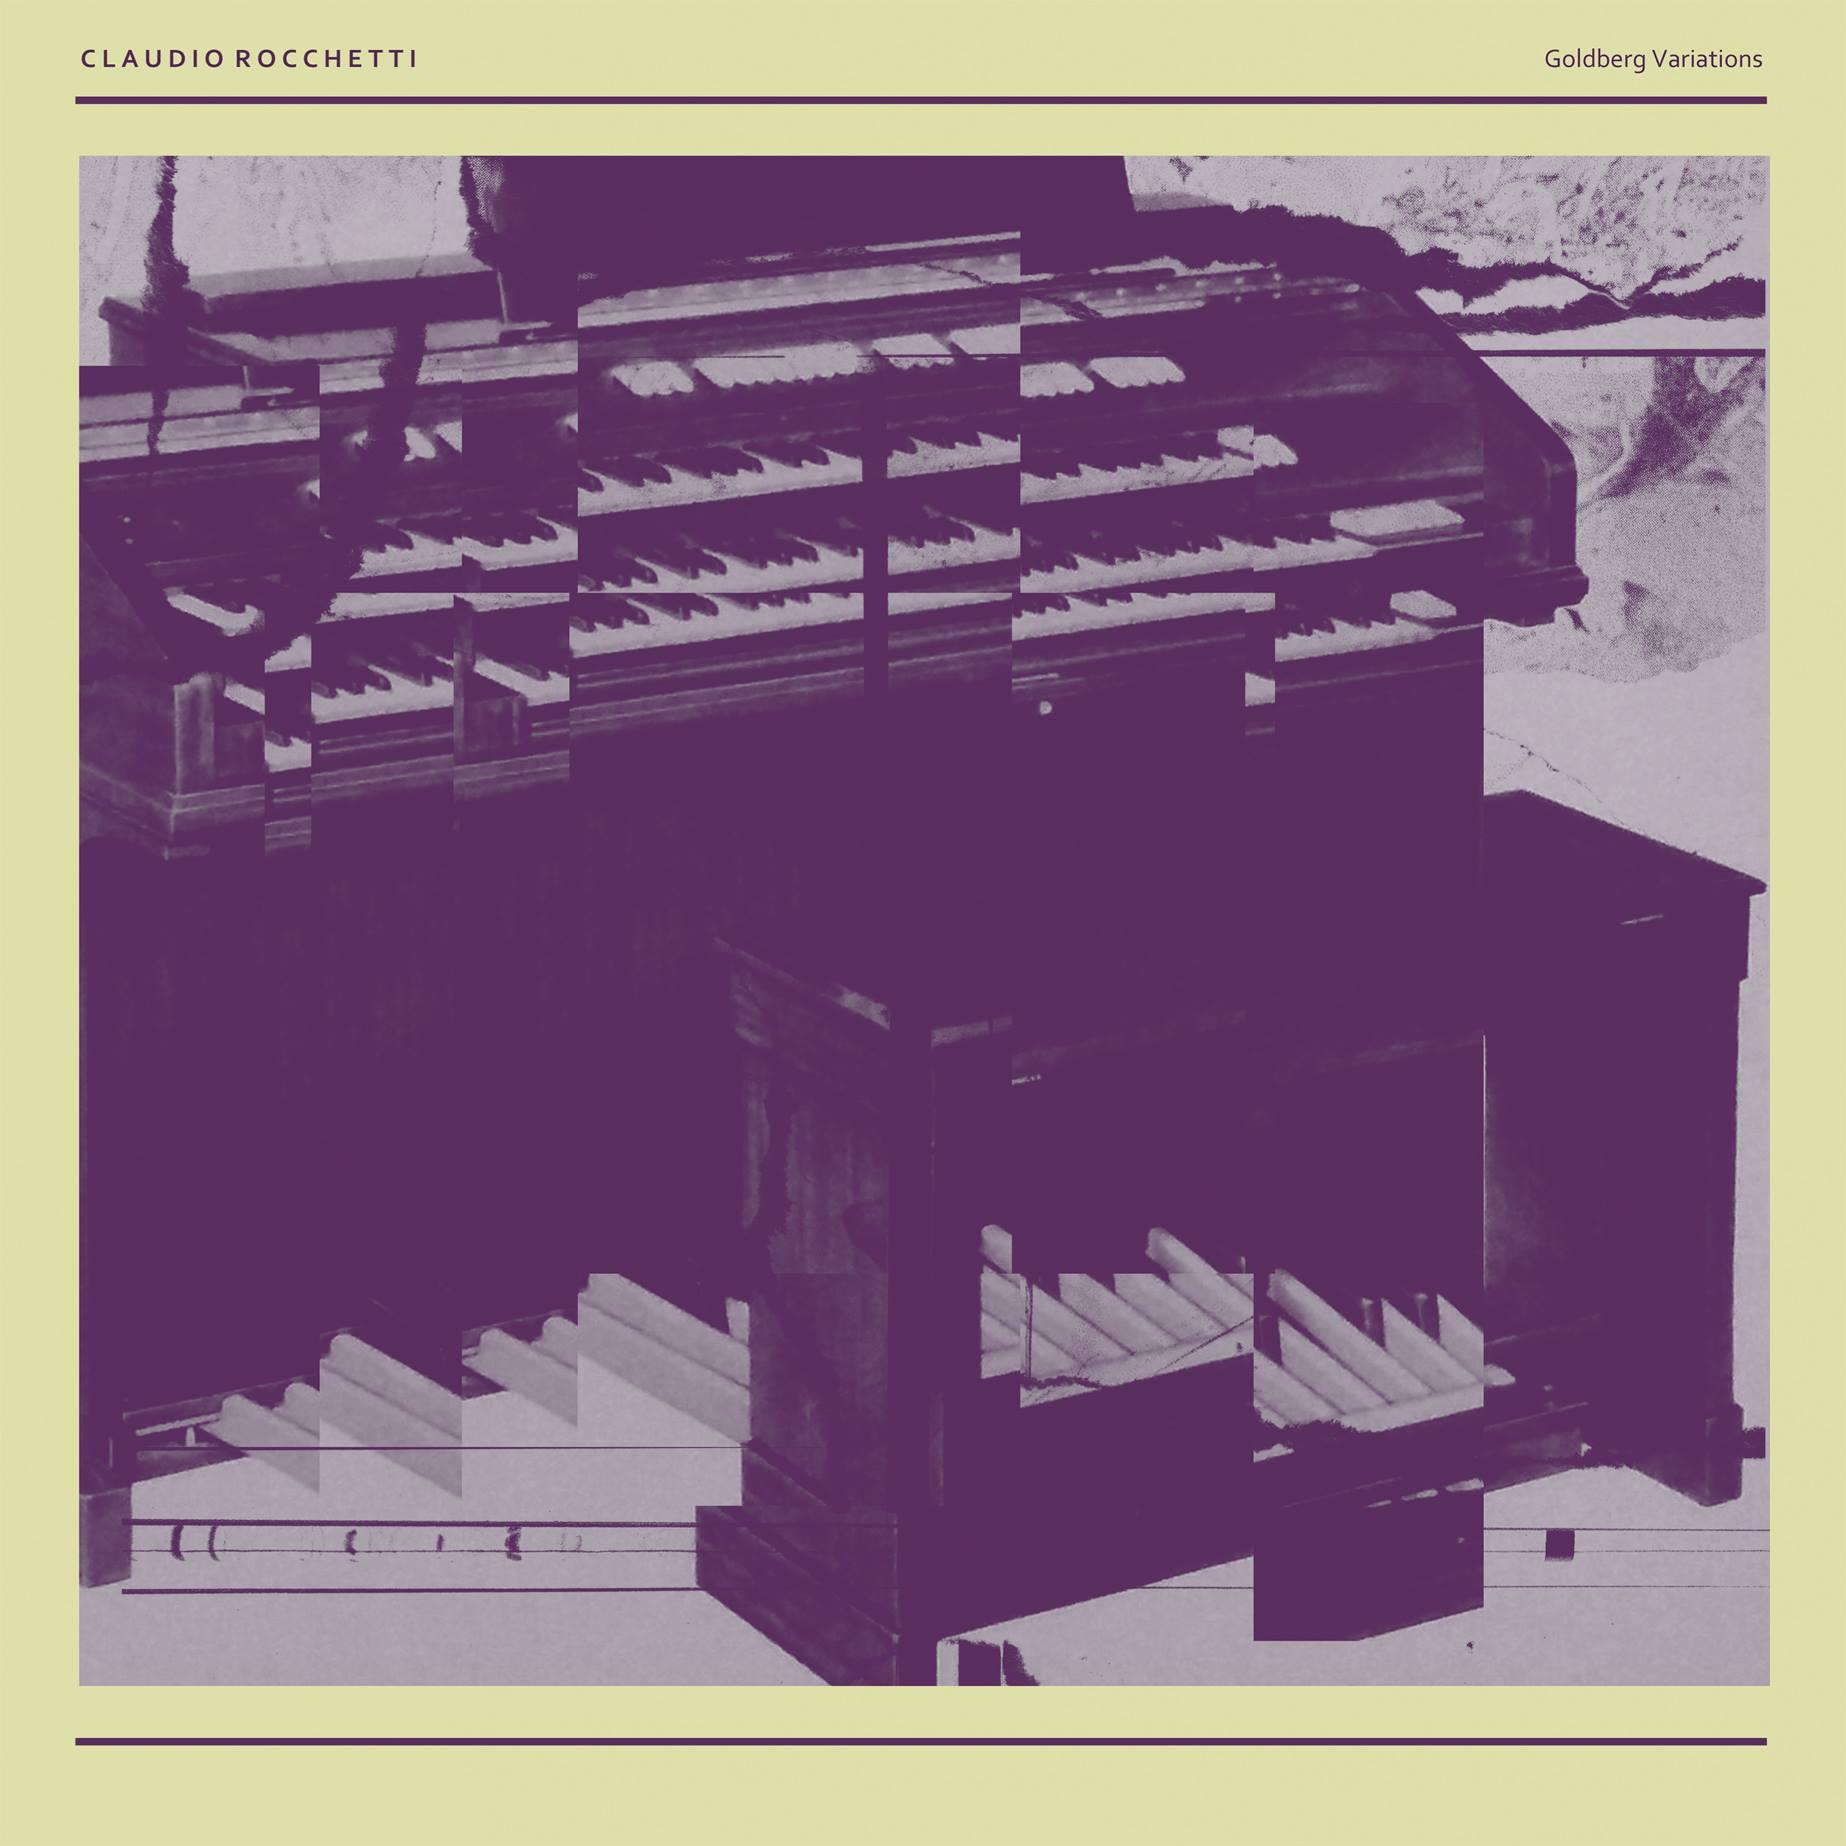 Claudio Rocchetti - Goldberg Variations